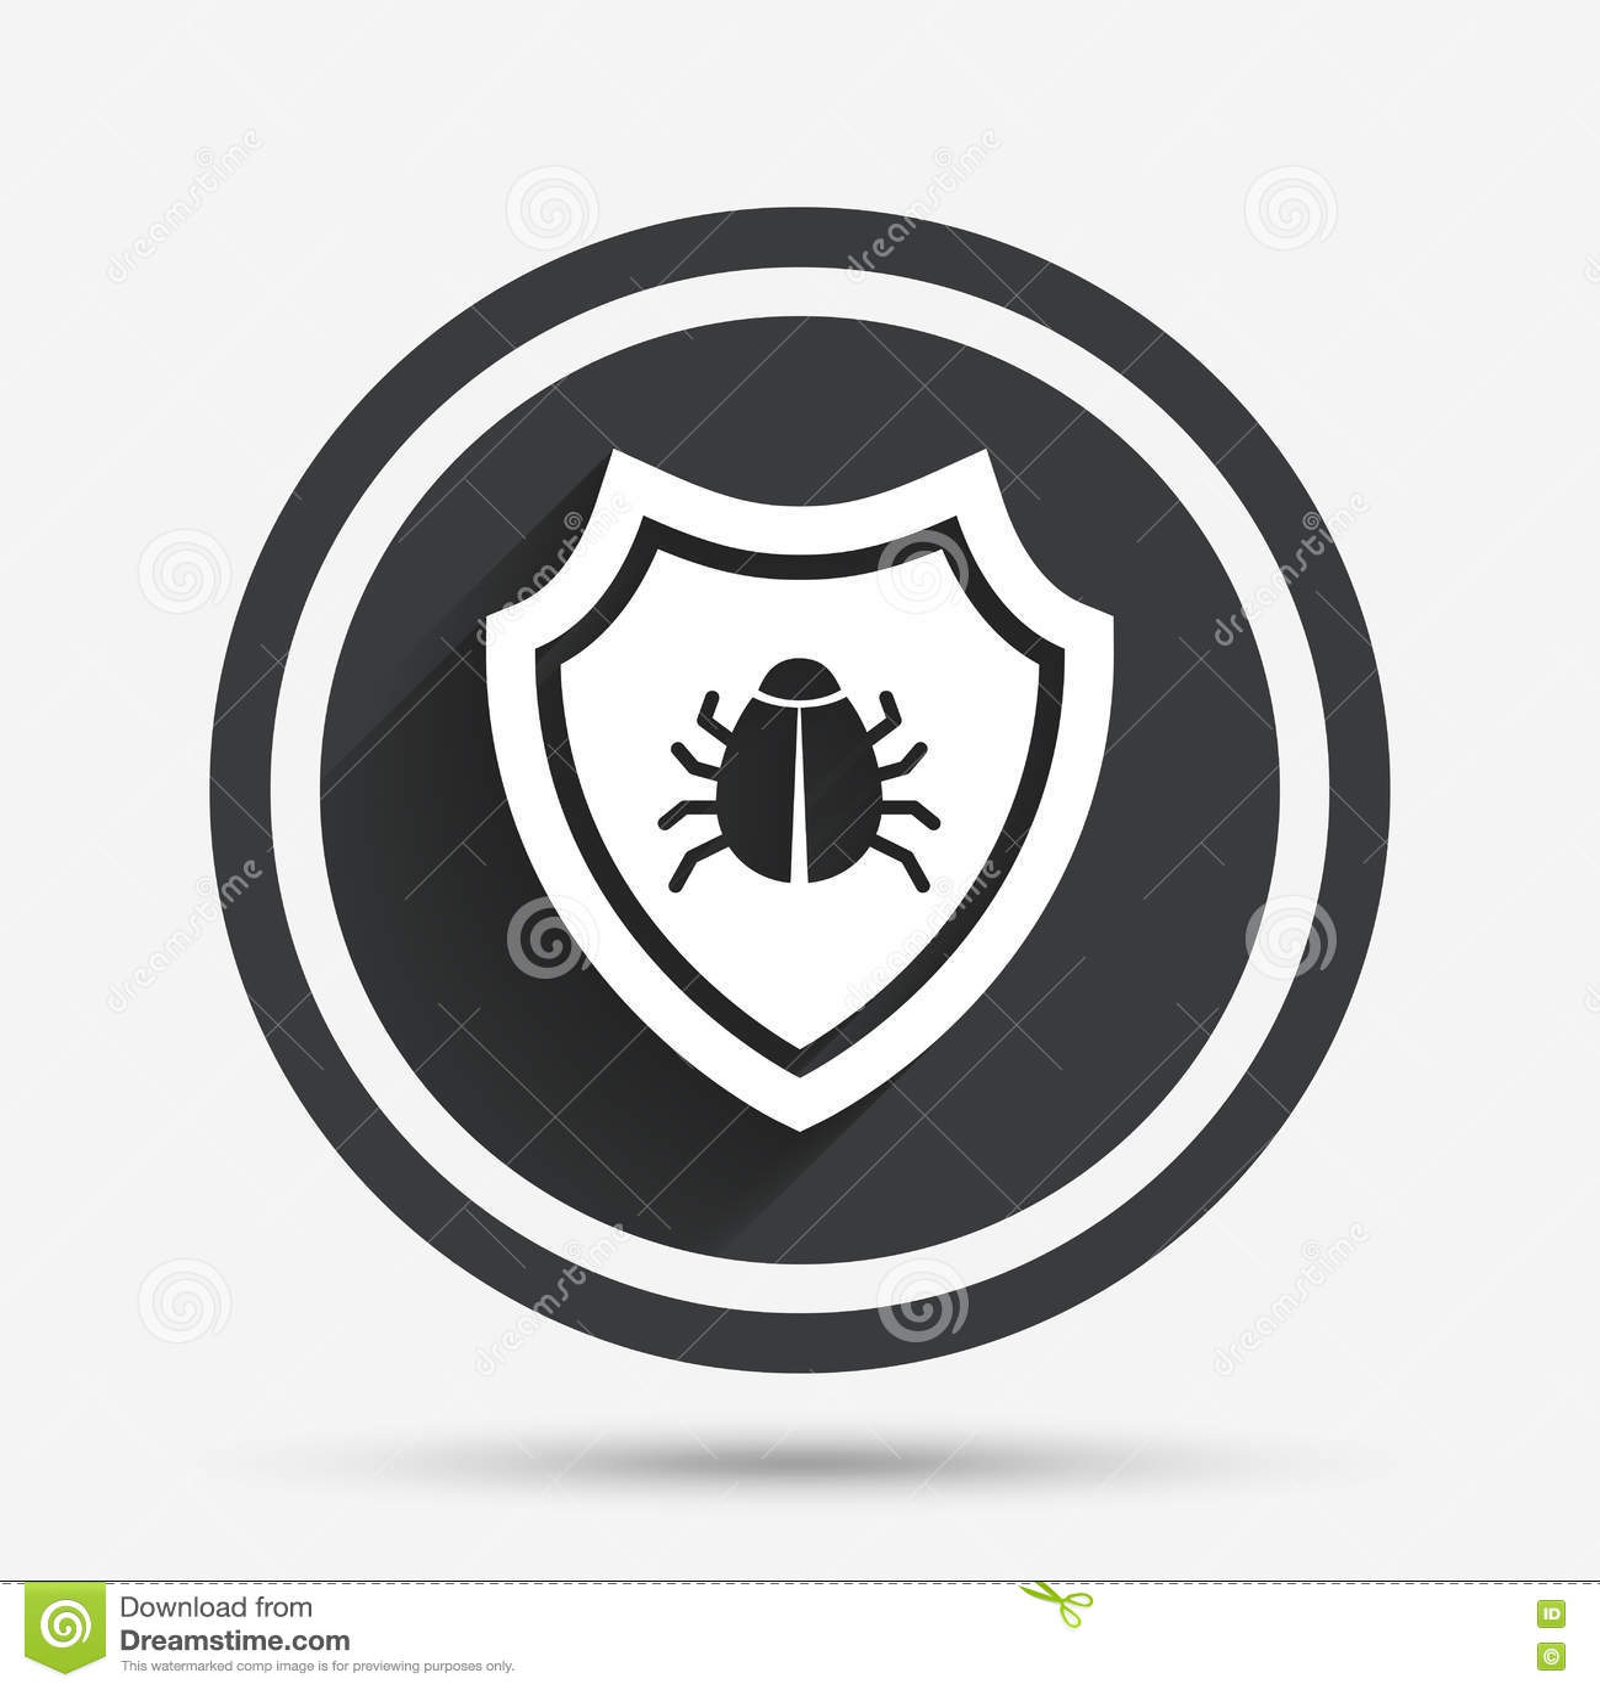 Ic ne de signe de bouclier symbole de protection de virus - Symbole de protection ...